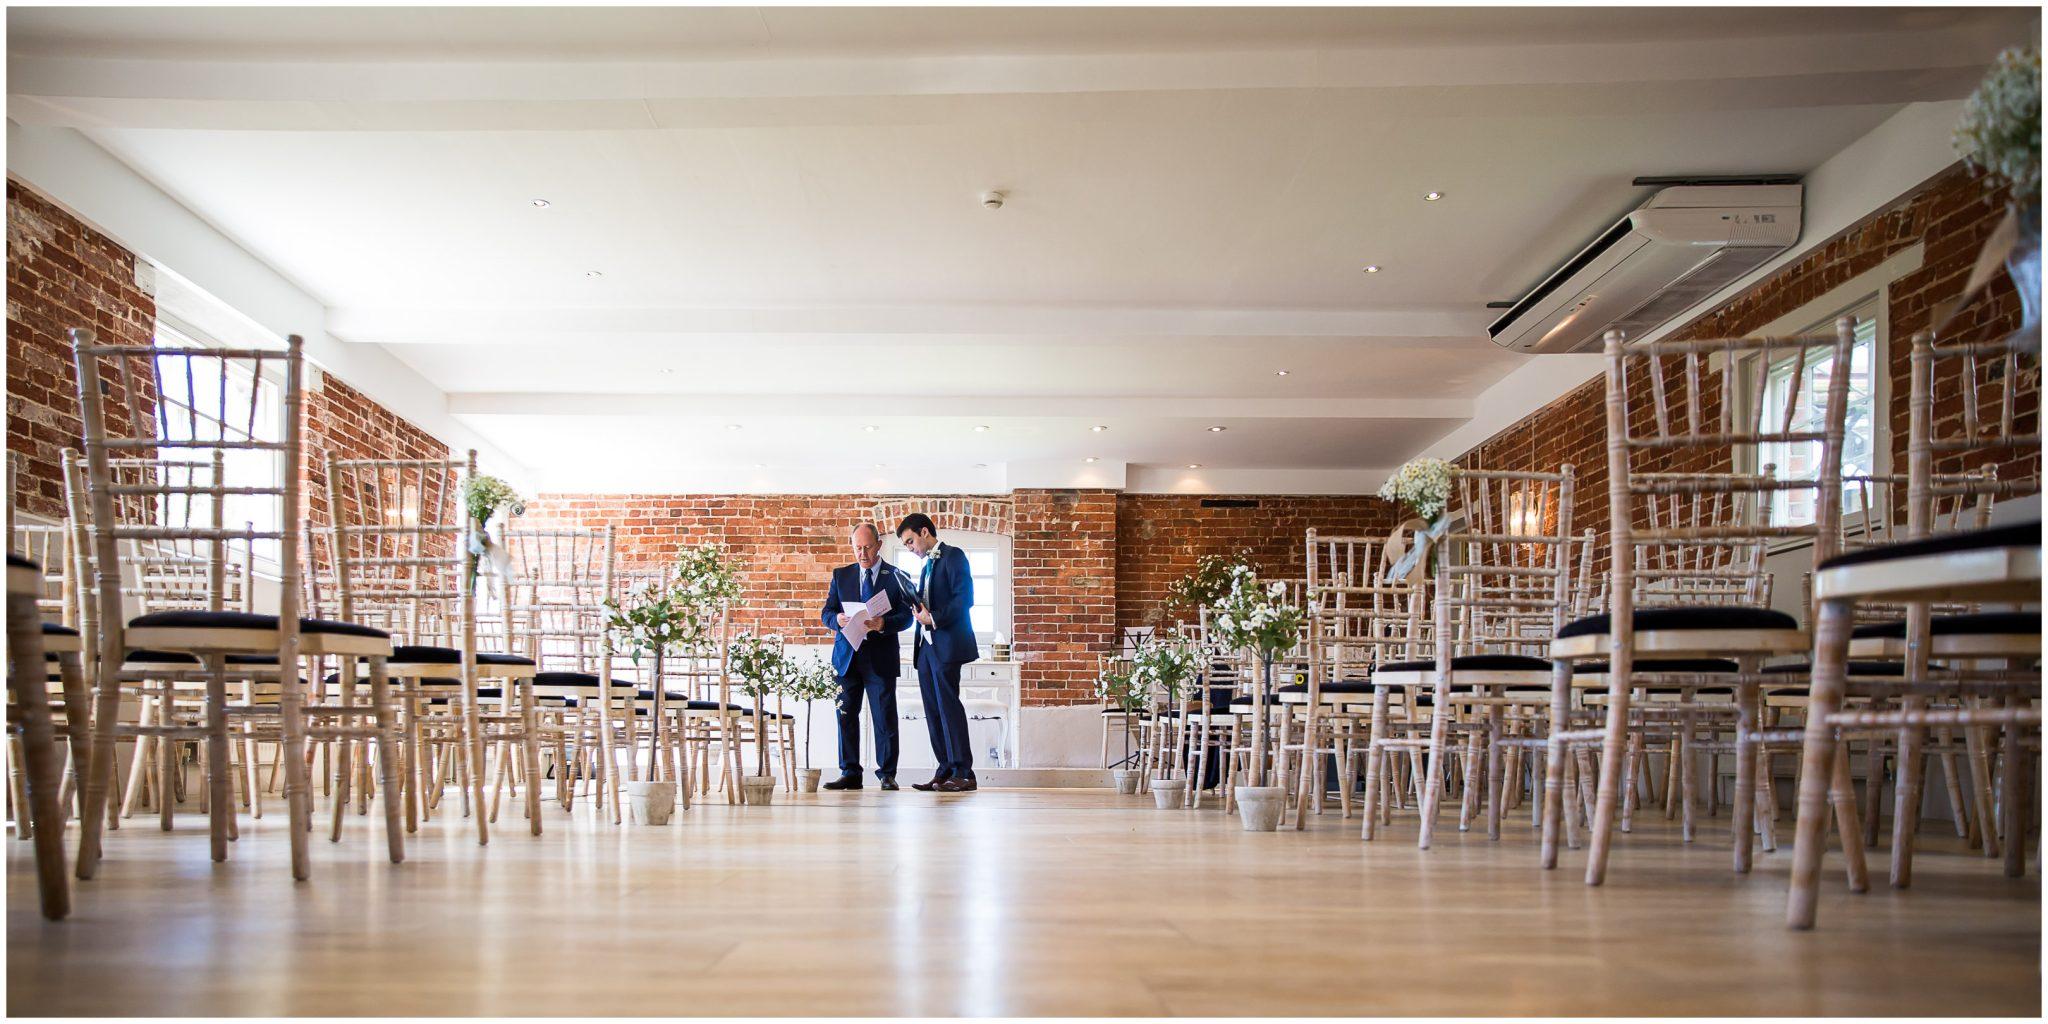 Sopley Mill Summer wedding groom with registrar before ceremony